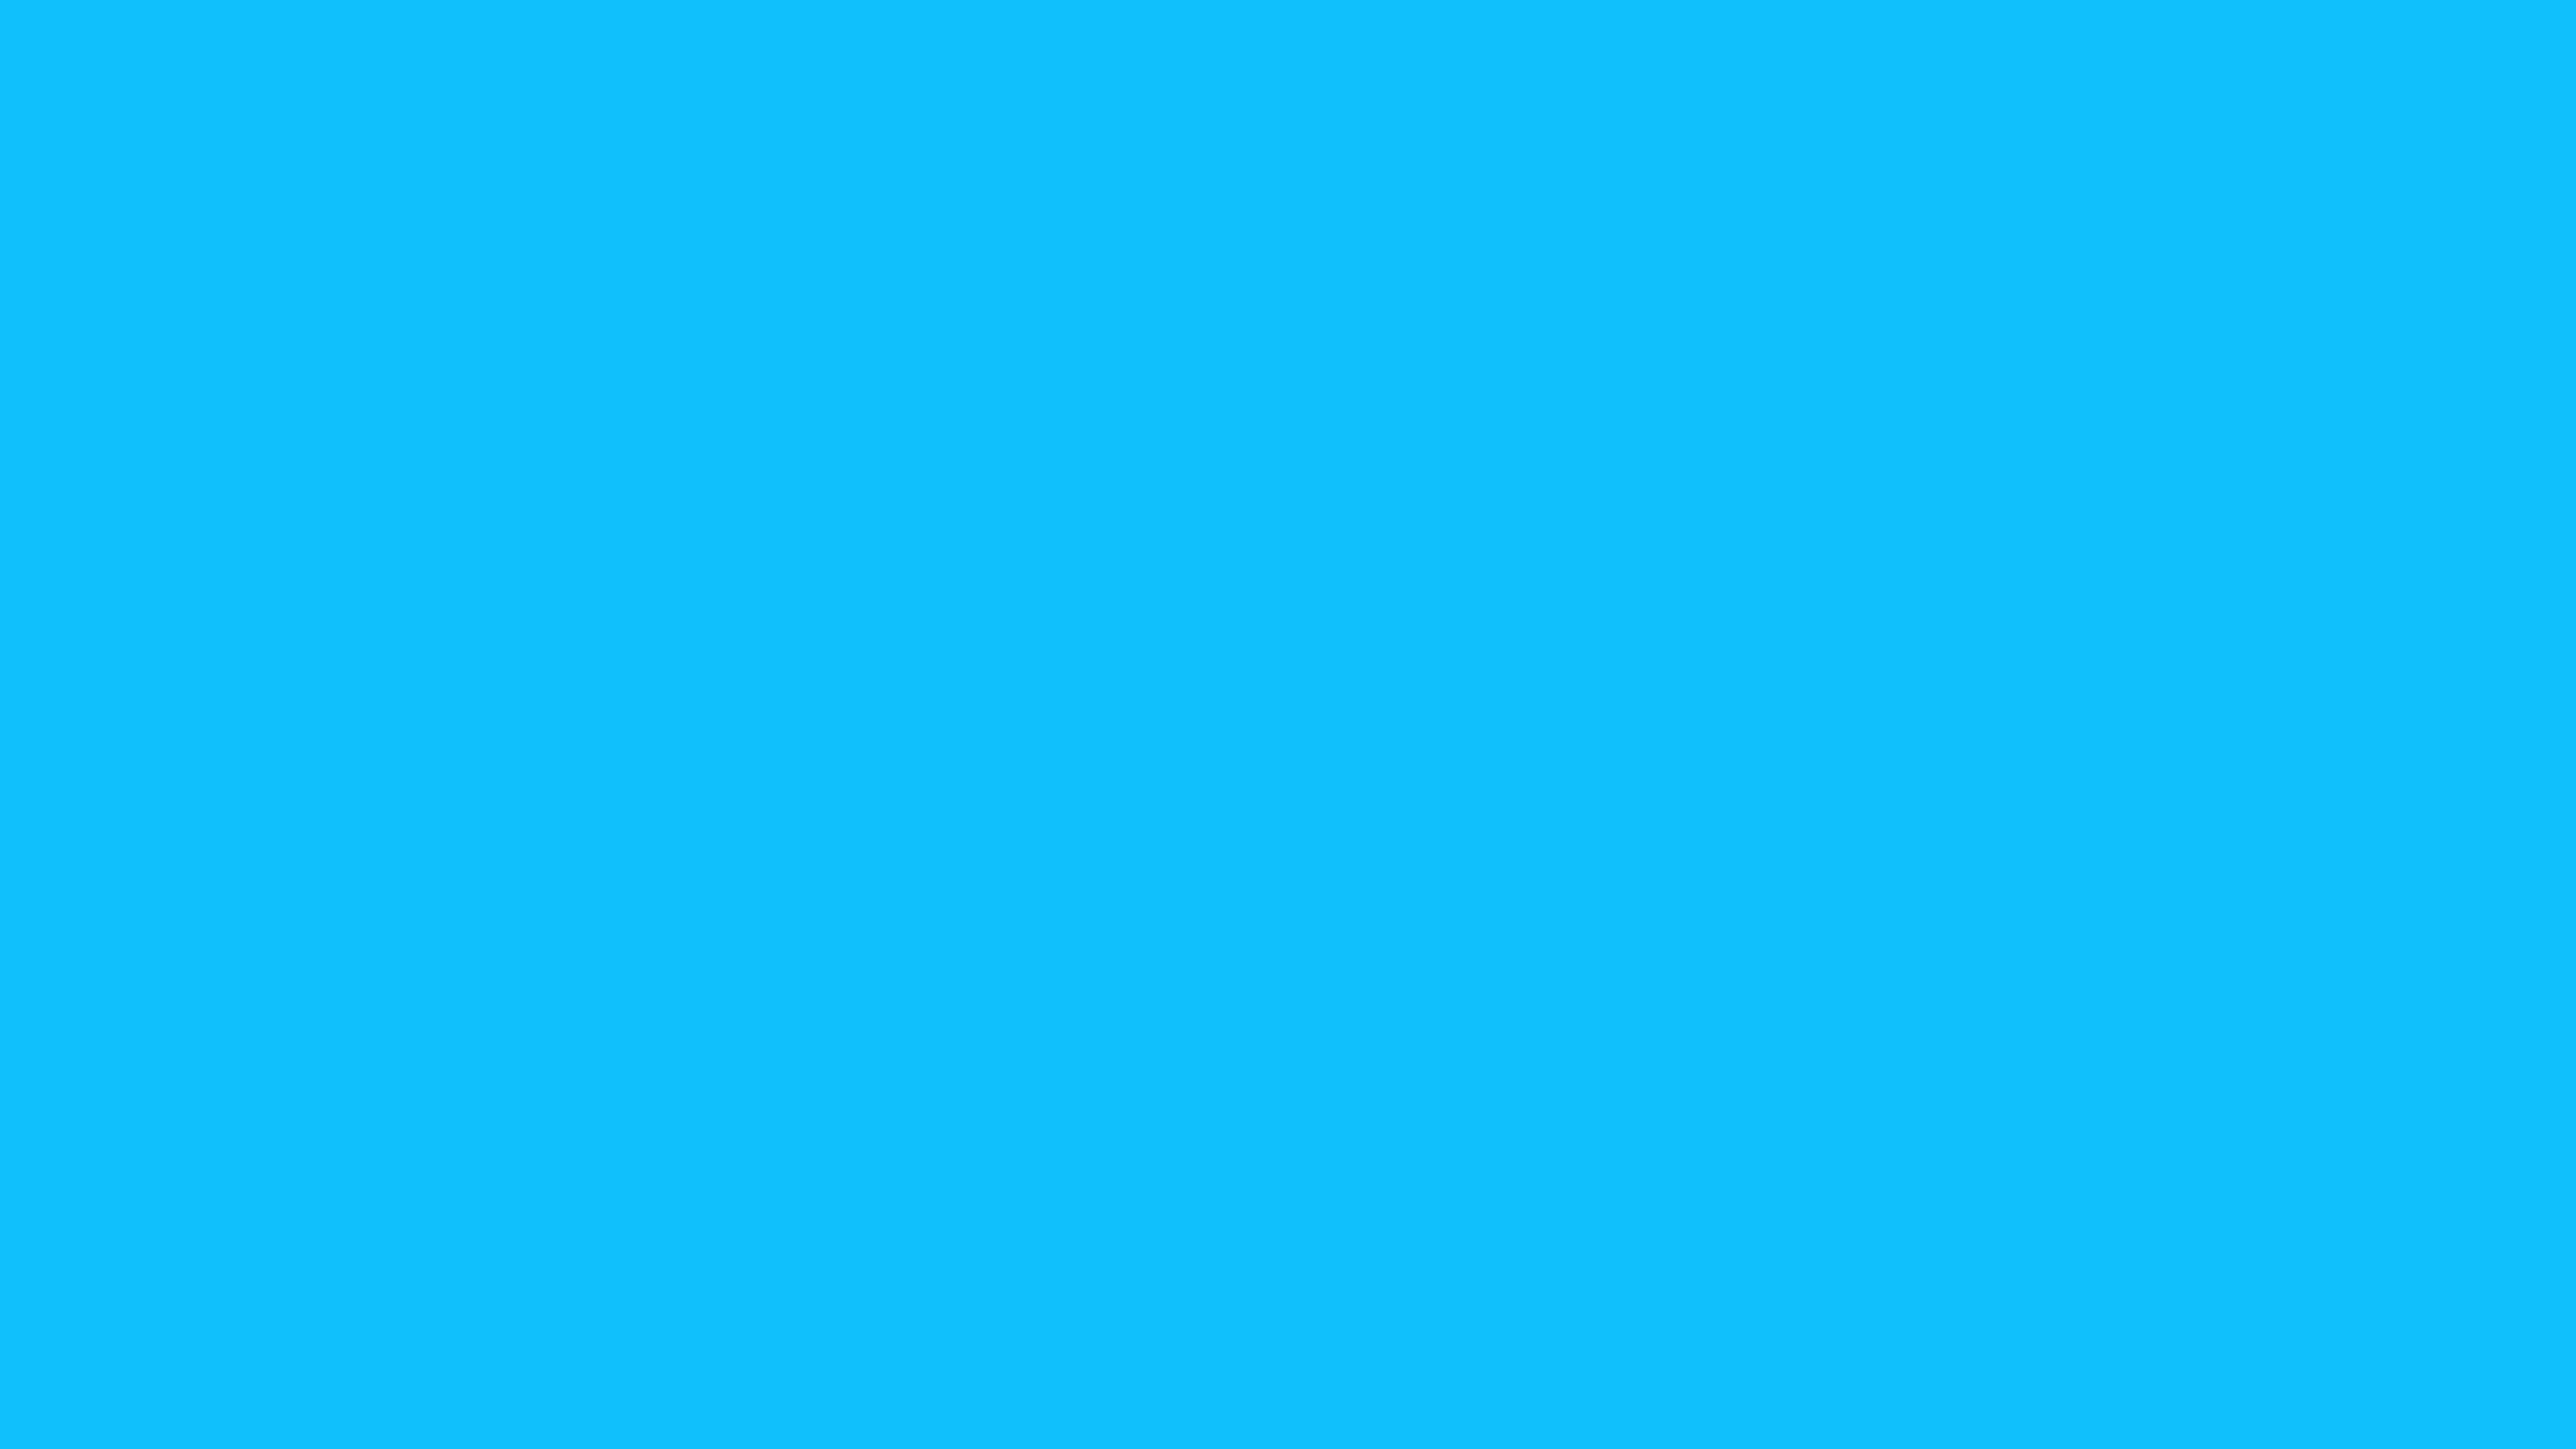 7680x4320 Spiro Disco Ball Solid Color Background